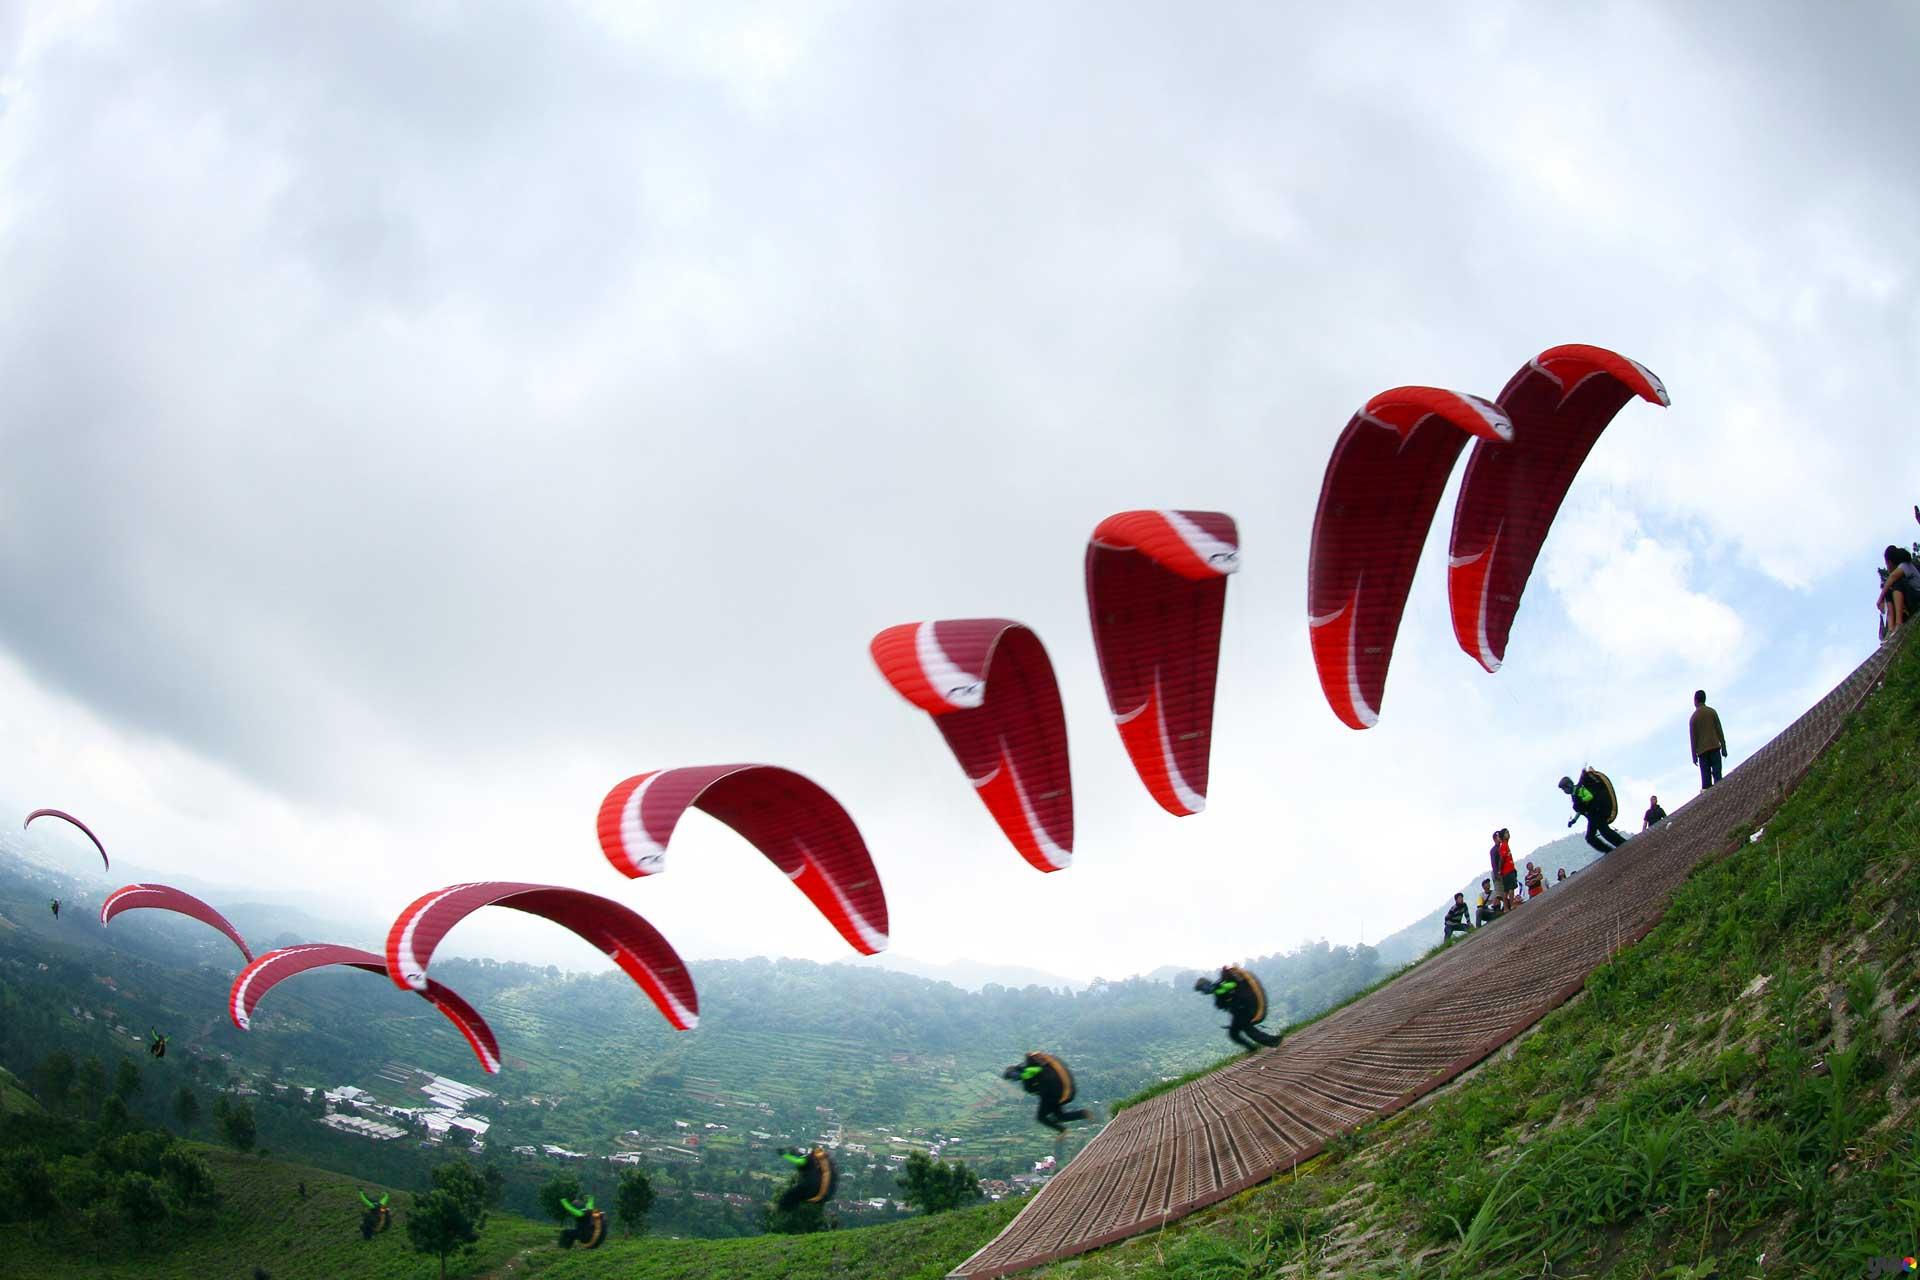 0812 9393 9797, Sewa Paralayang Puncak, Puncak Paralayang